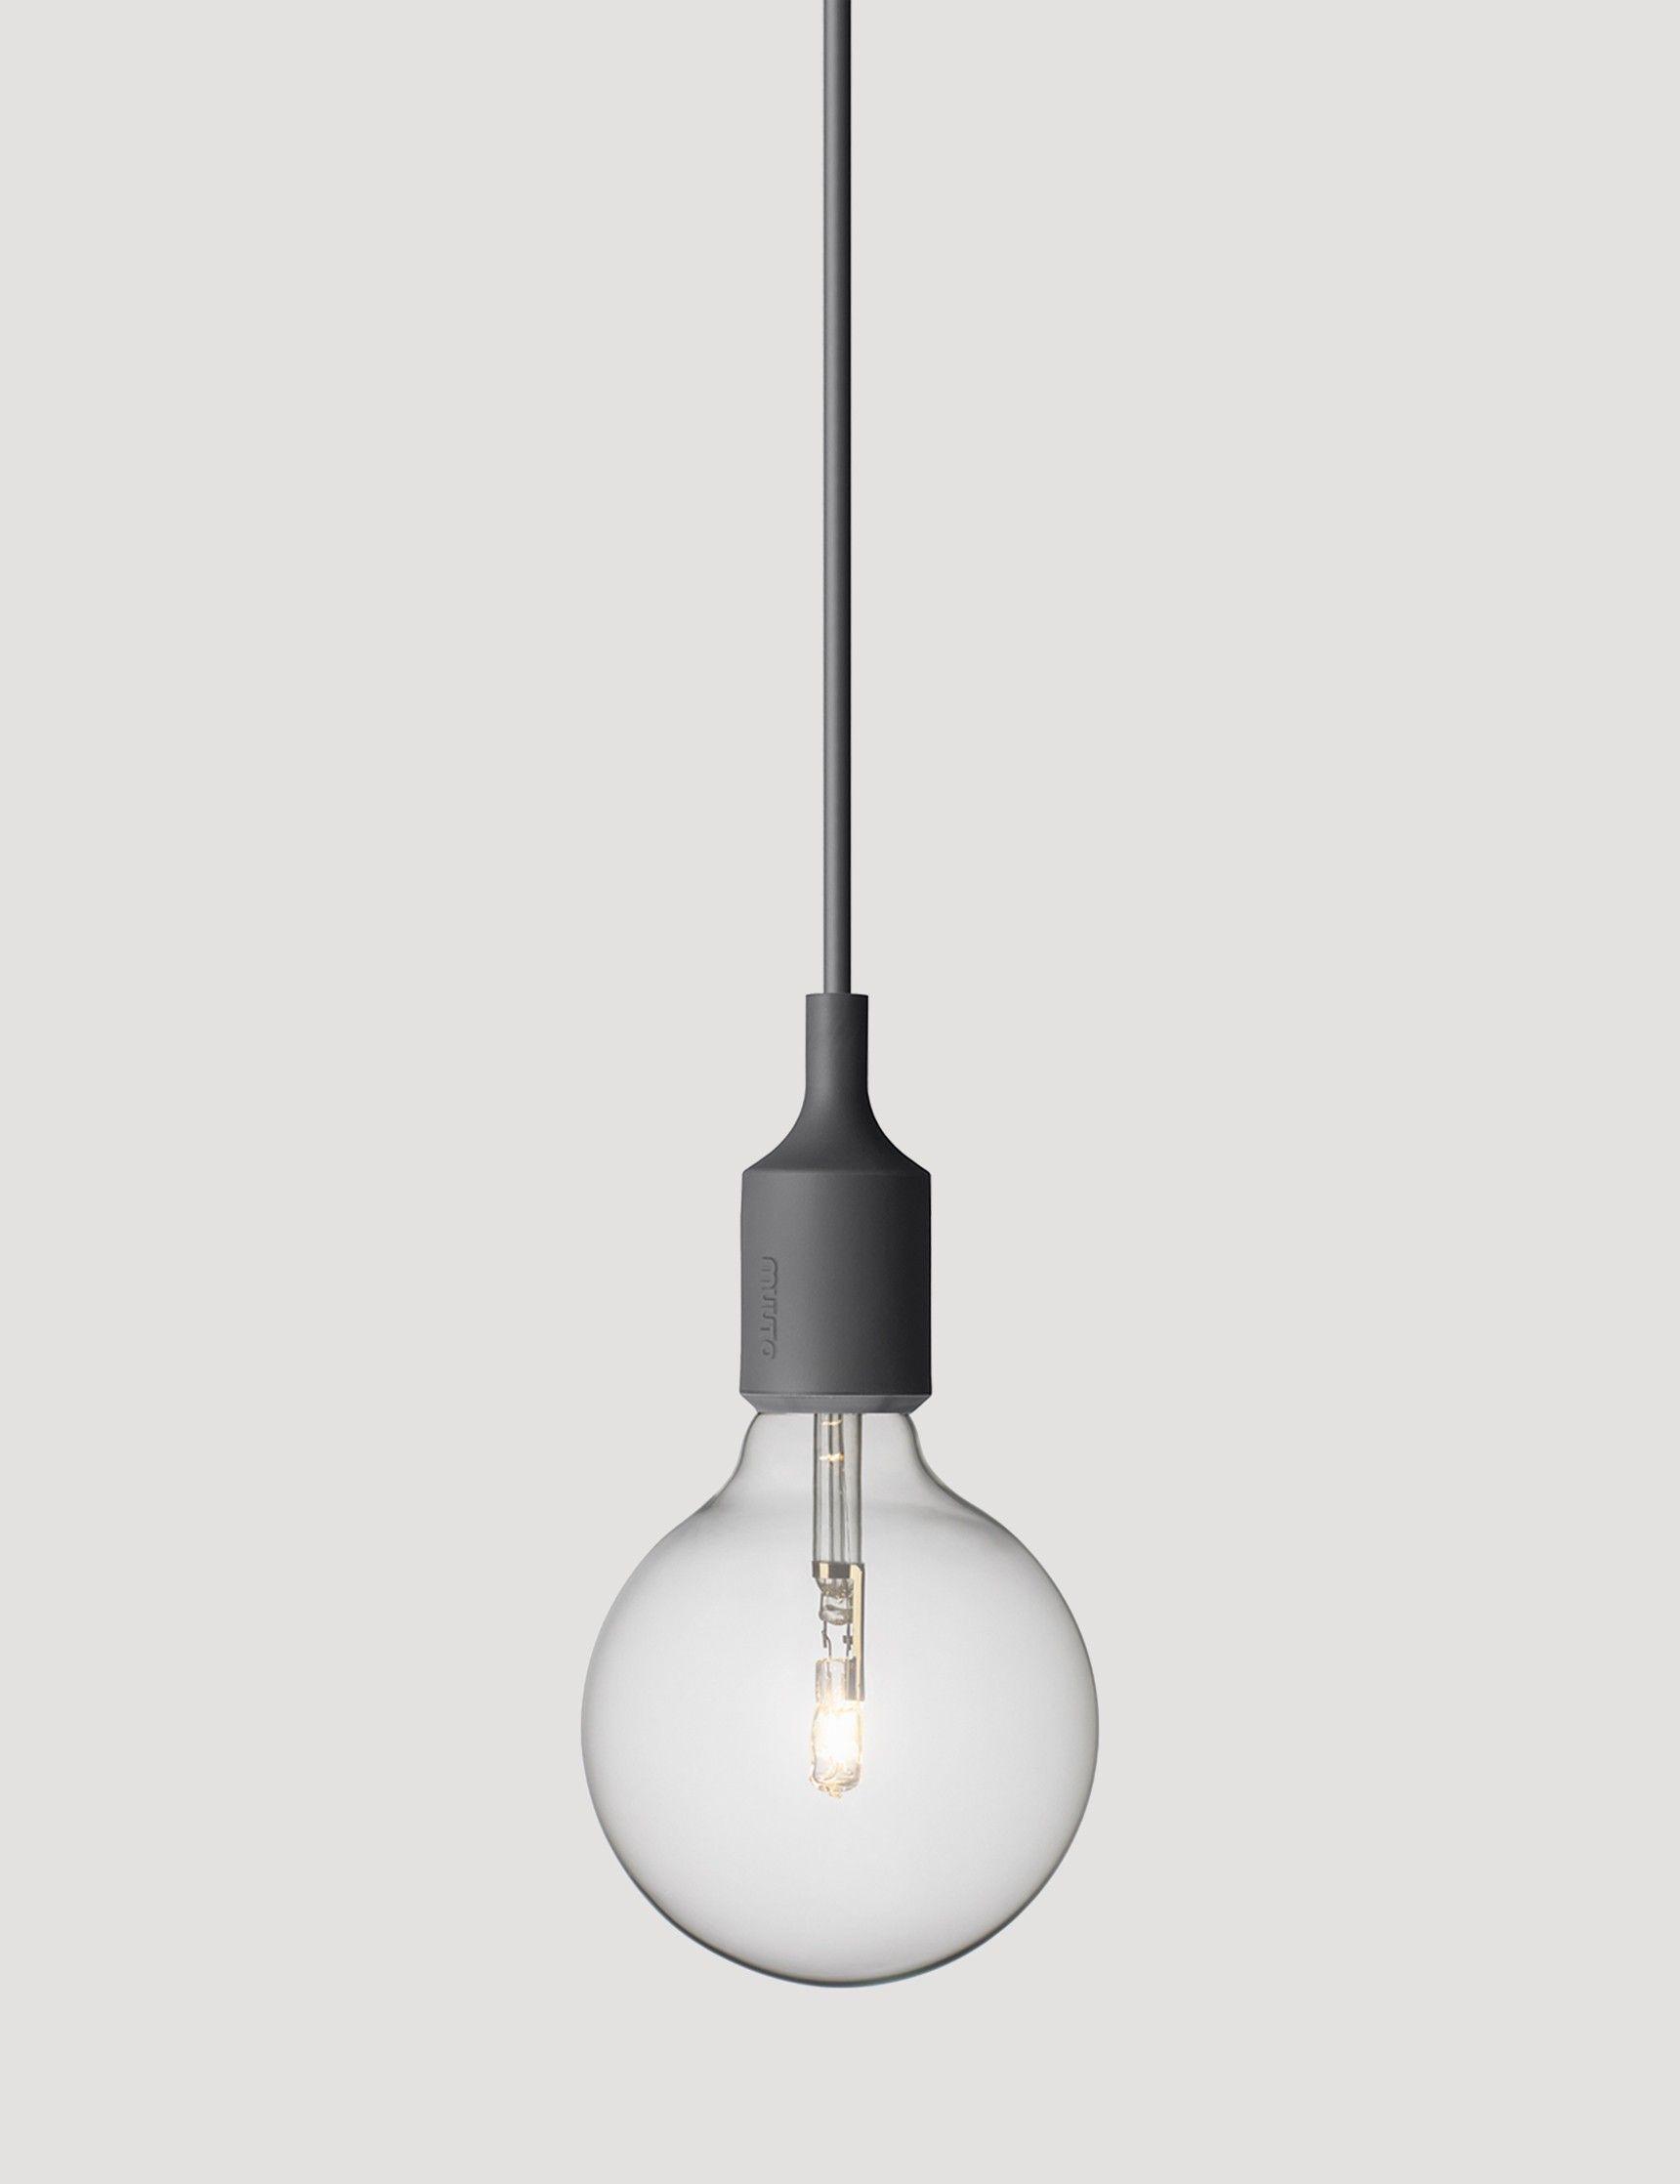 Pin By Erica On Lighting Muuto Pendant Light Pendant Lamp Bulb